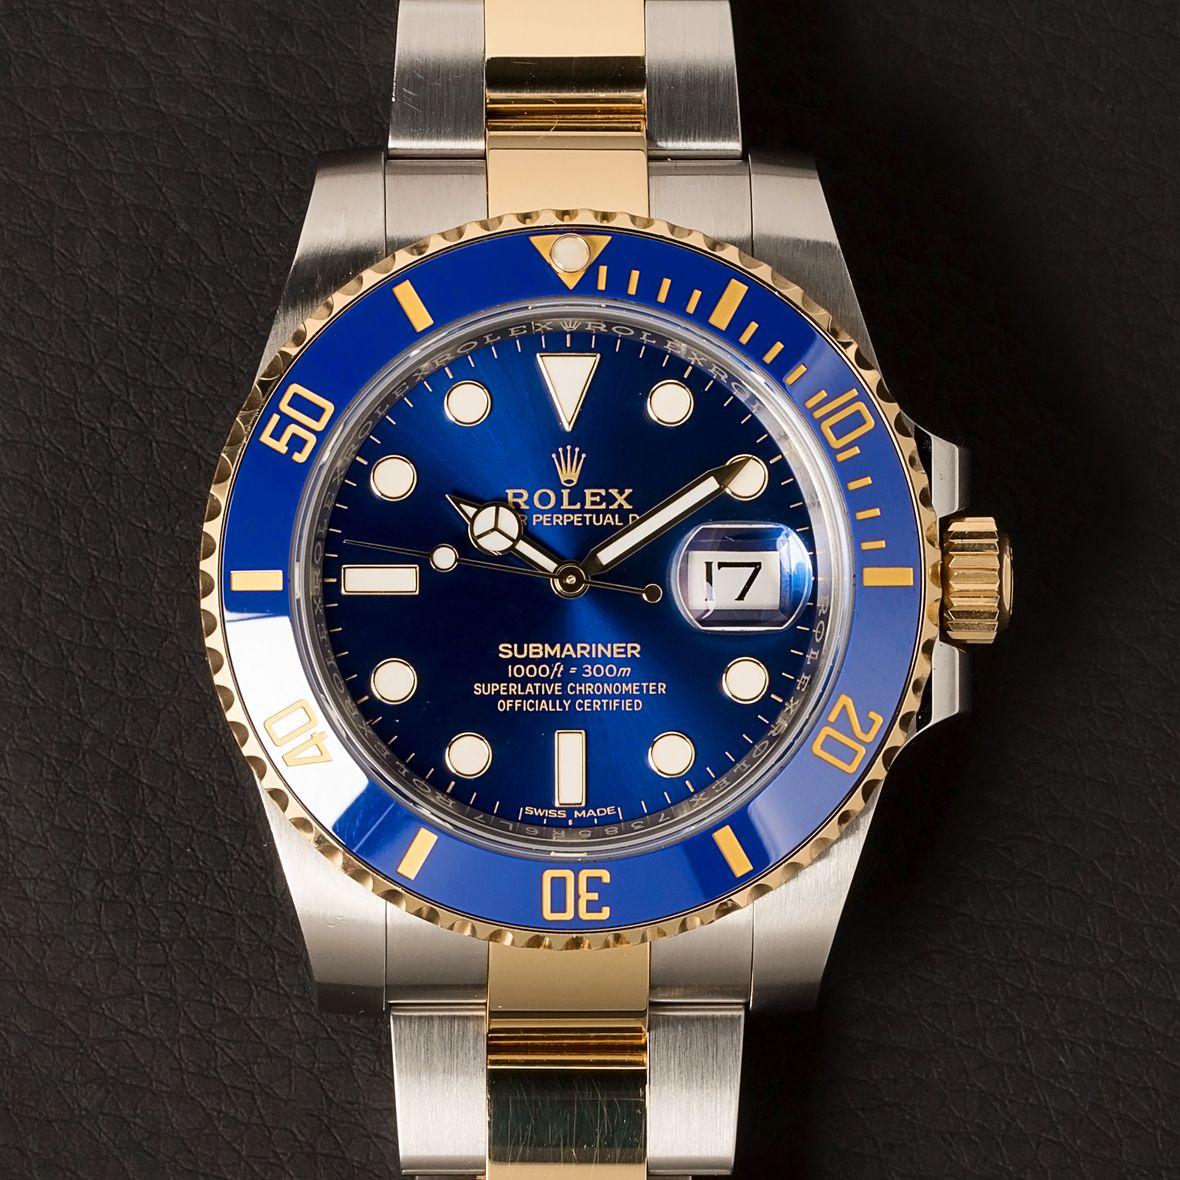 Rolex Submariner Date 116613LB Two-Tone